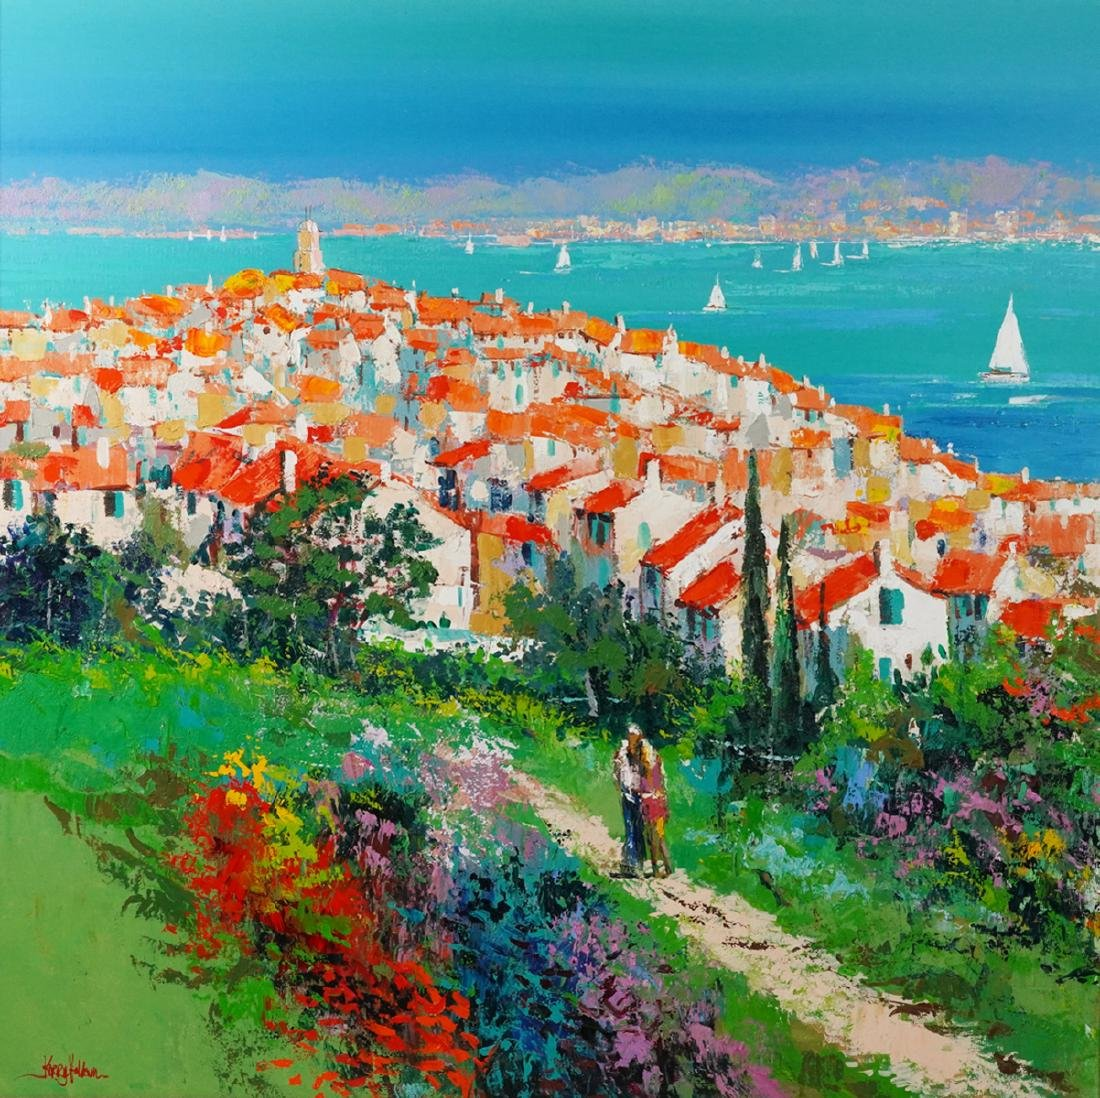 Robert Philipp 'In Love Again' Oil Painting - 10